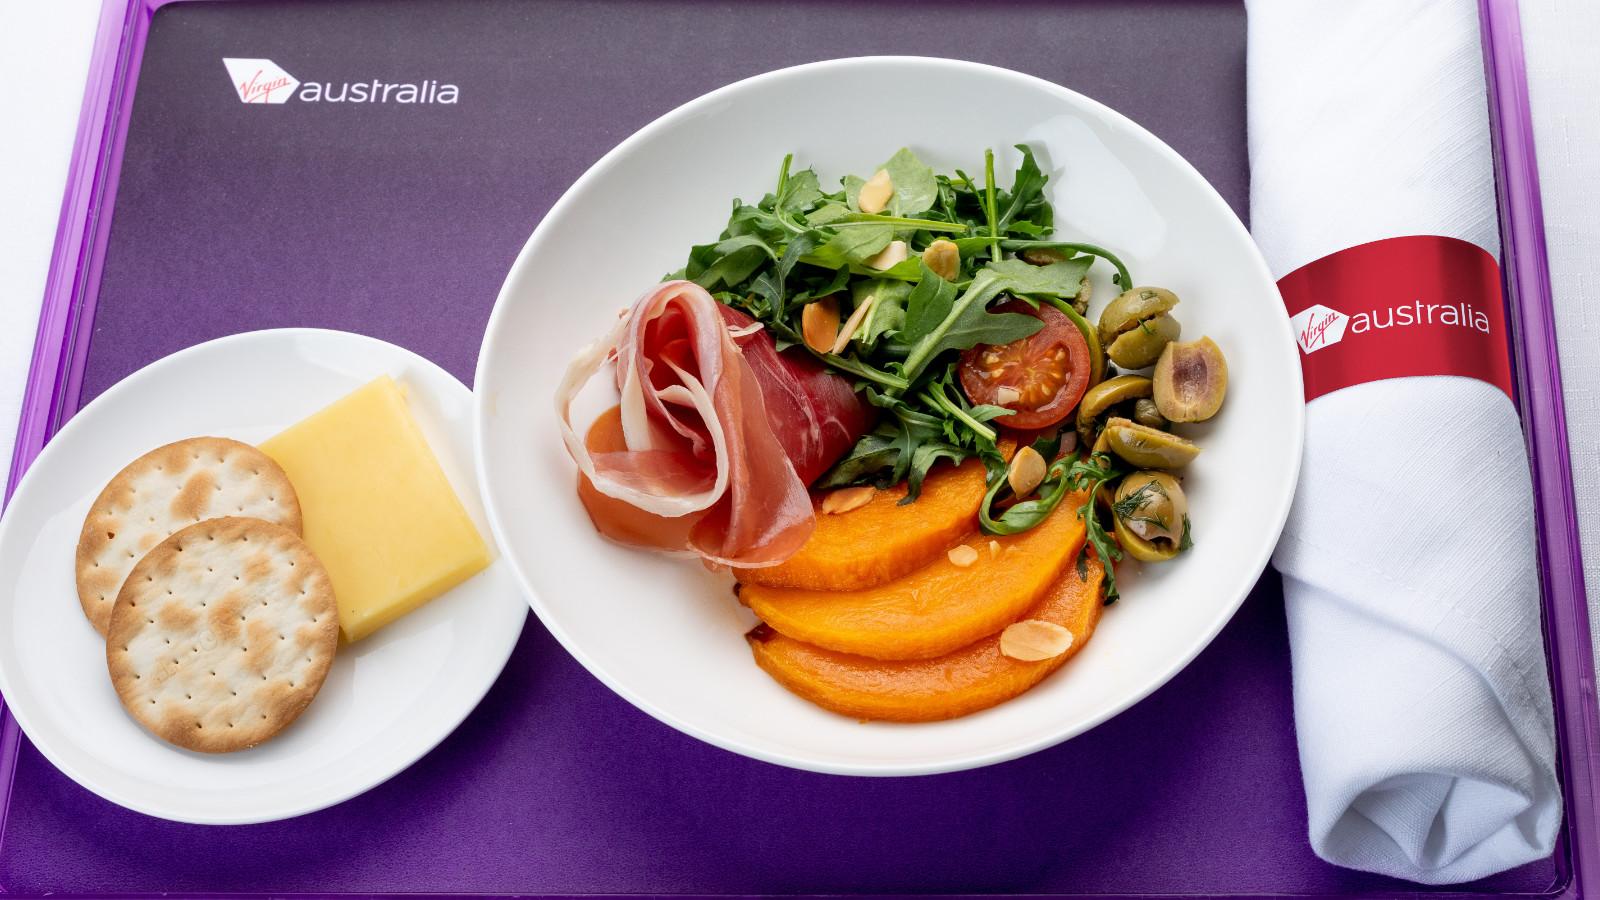 Virgin Australia Business Class Prosciutto Salad